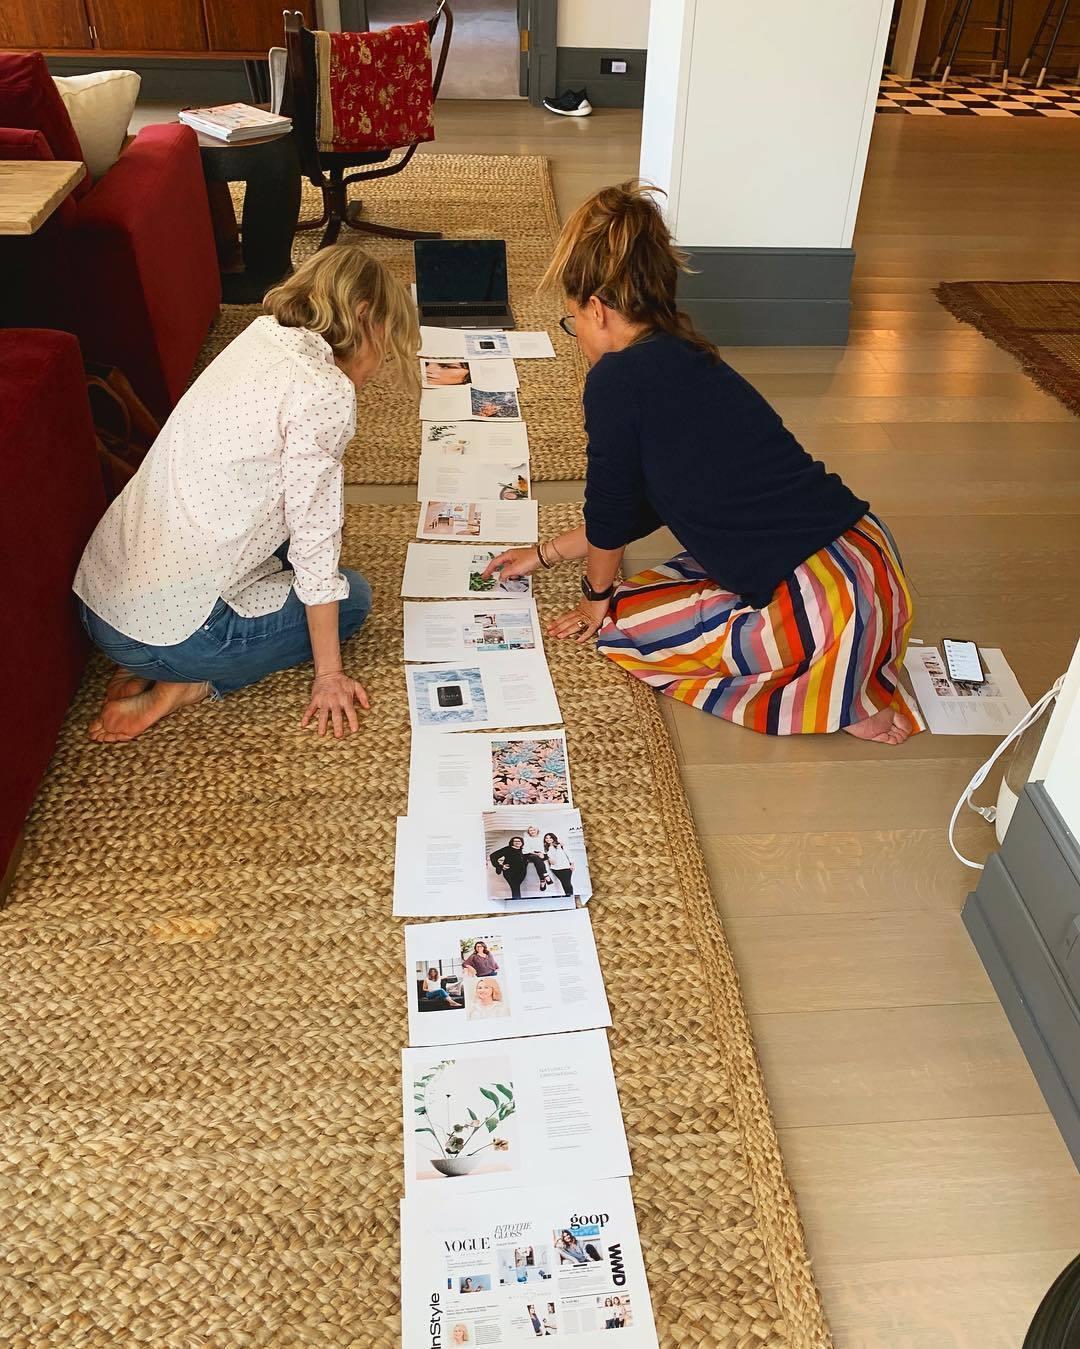 Image Gallery Naomi Duo 2019 07 08: Naomi Watts's Feet